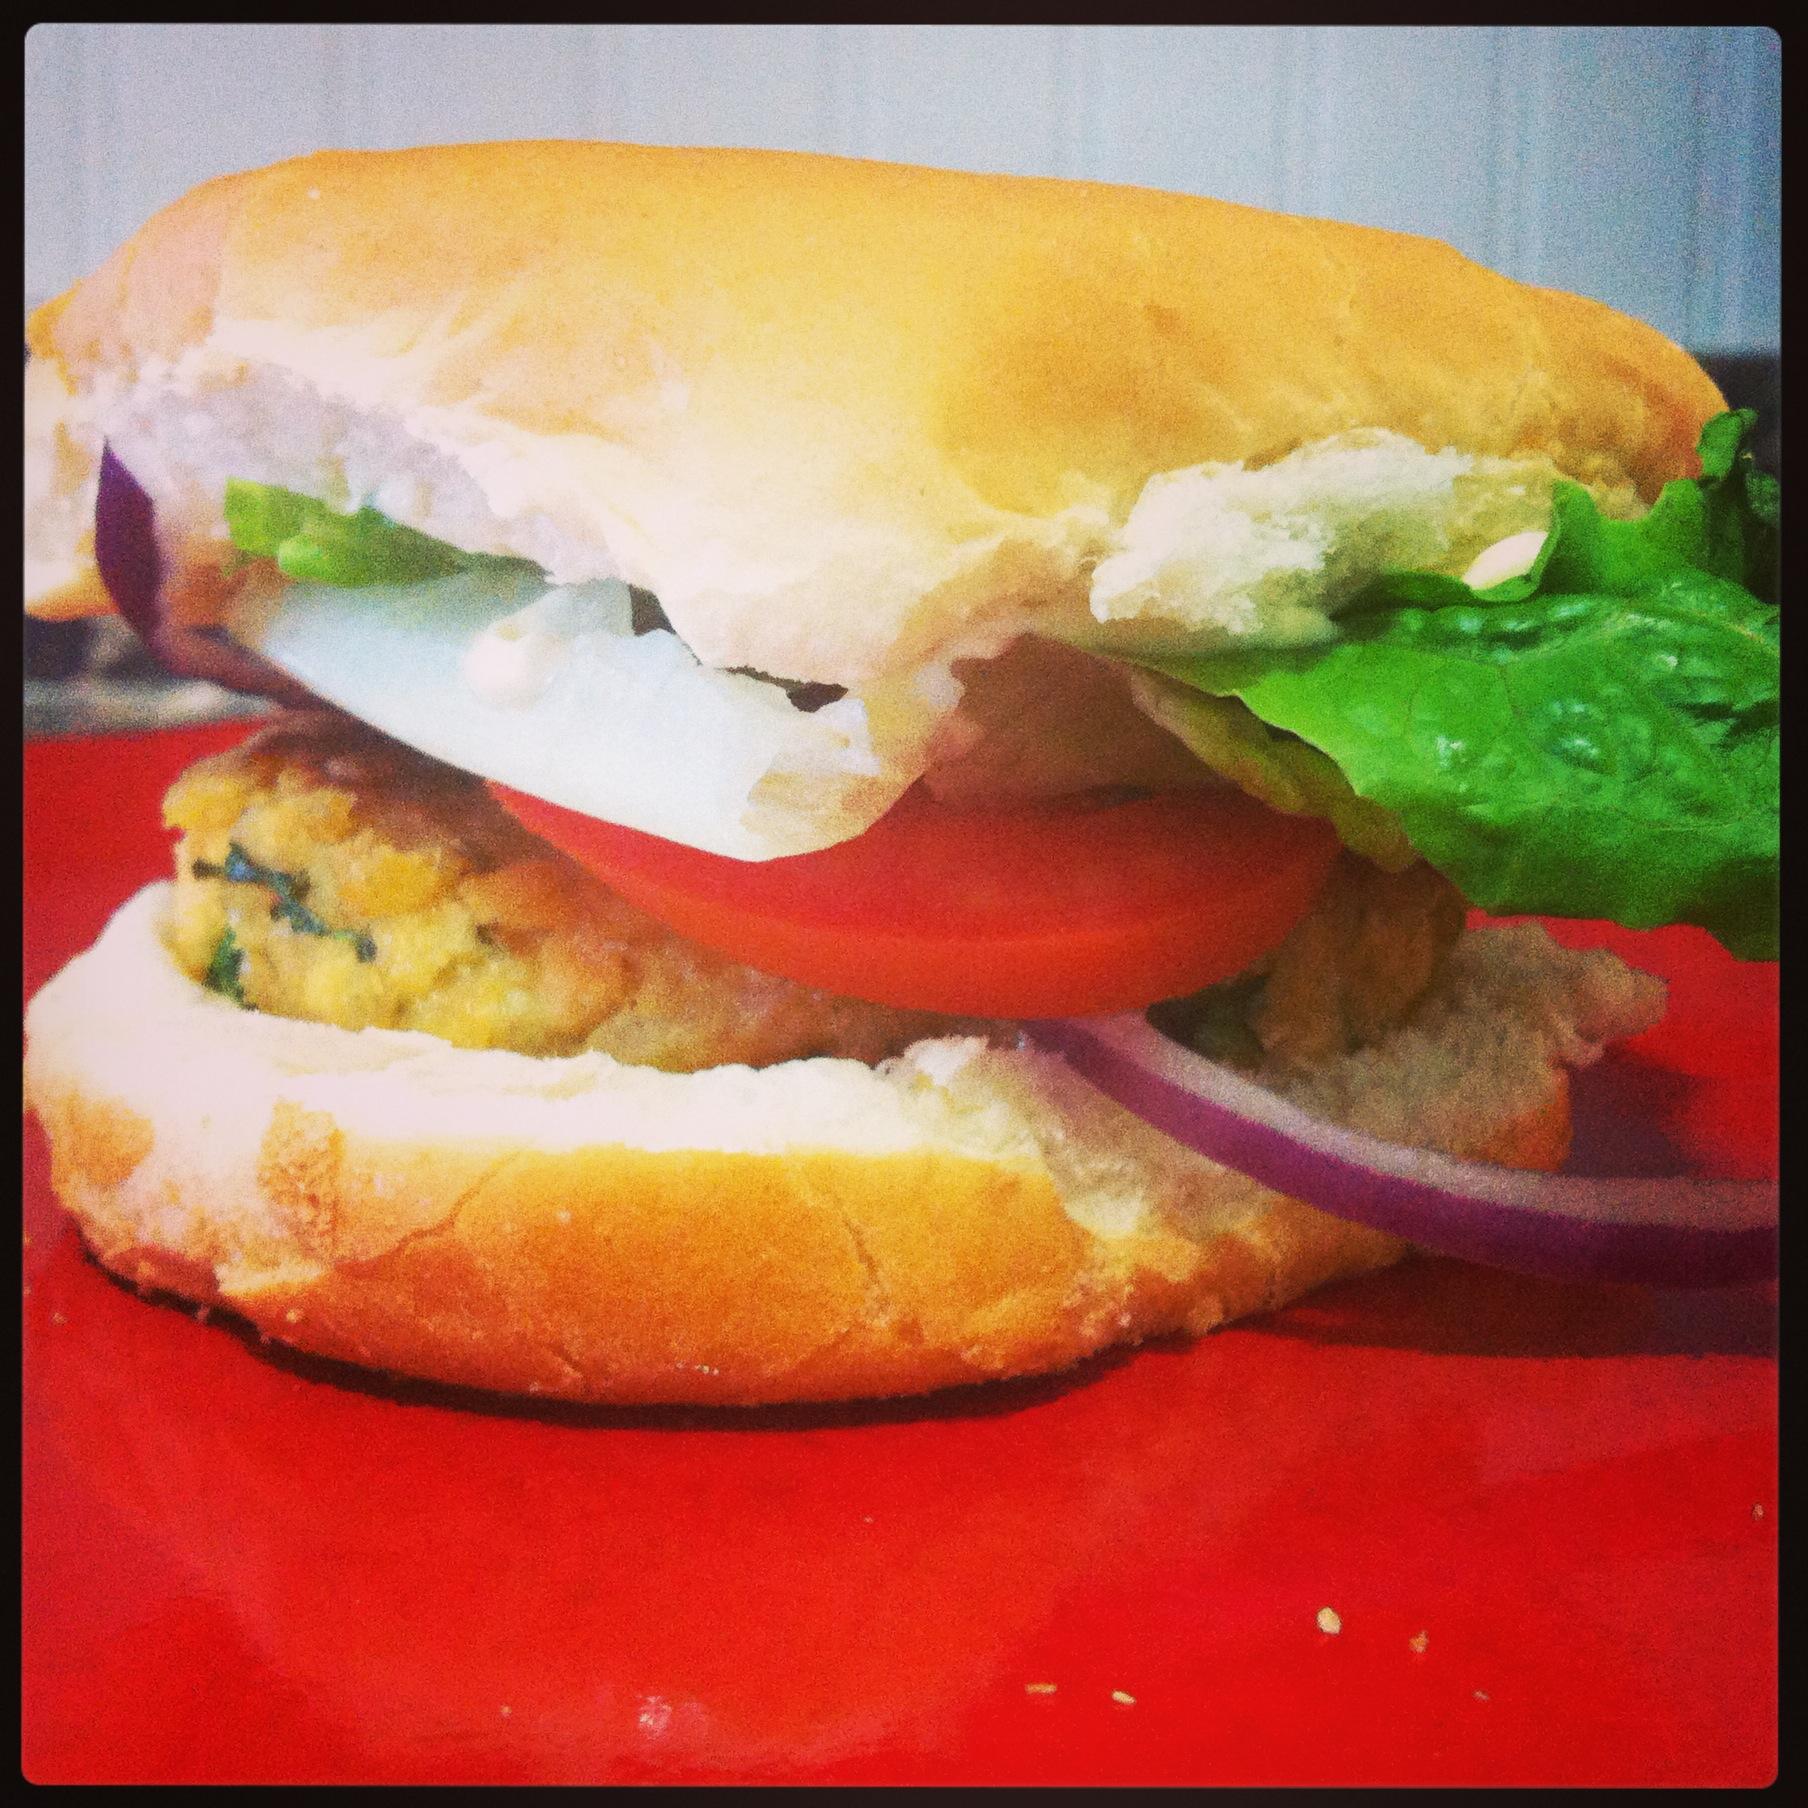 Salmon Patty Burger